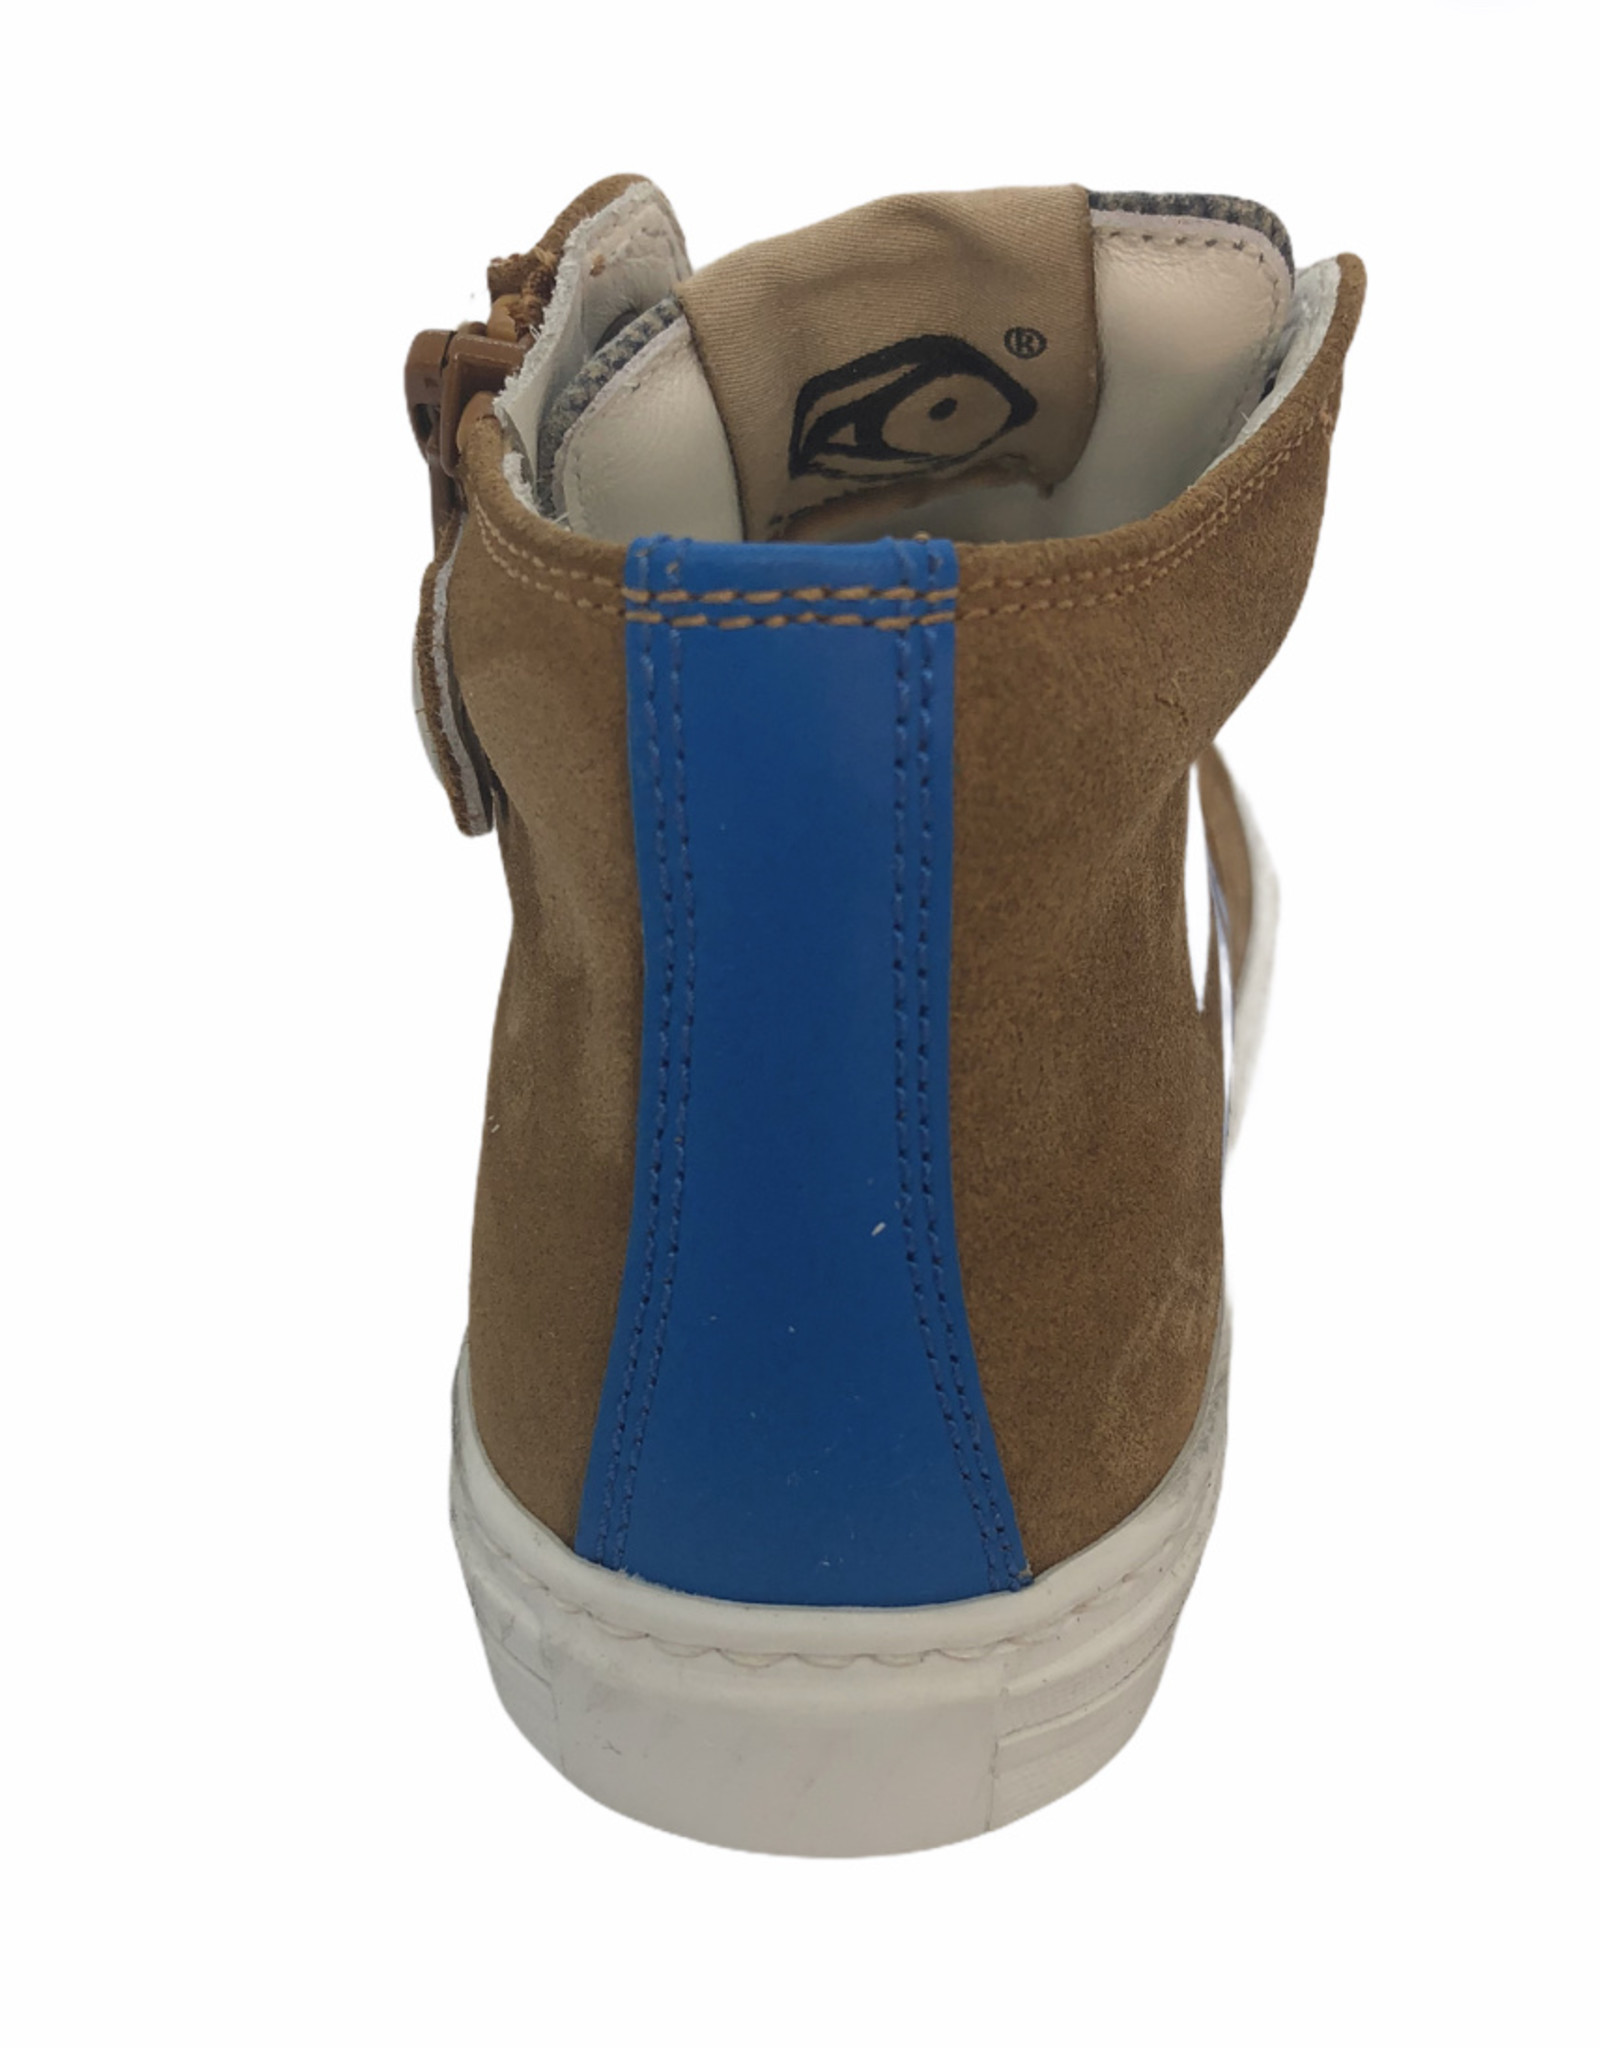 Rondinella 11840-1 hoge sneaker bruin blauw